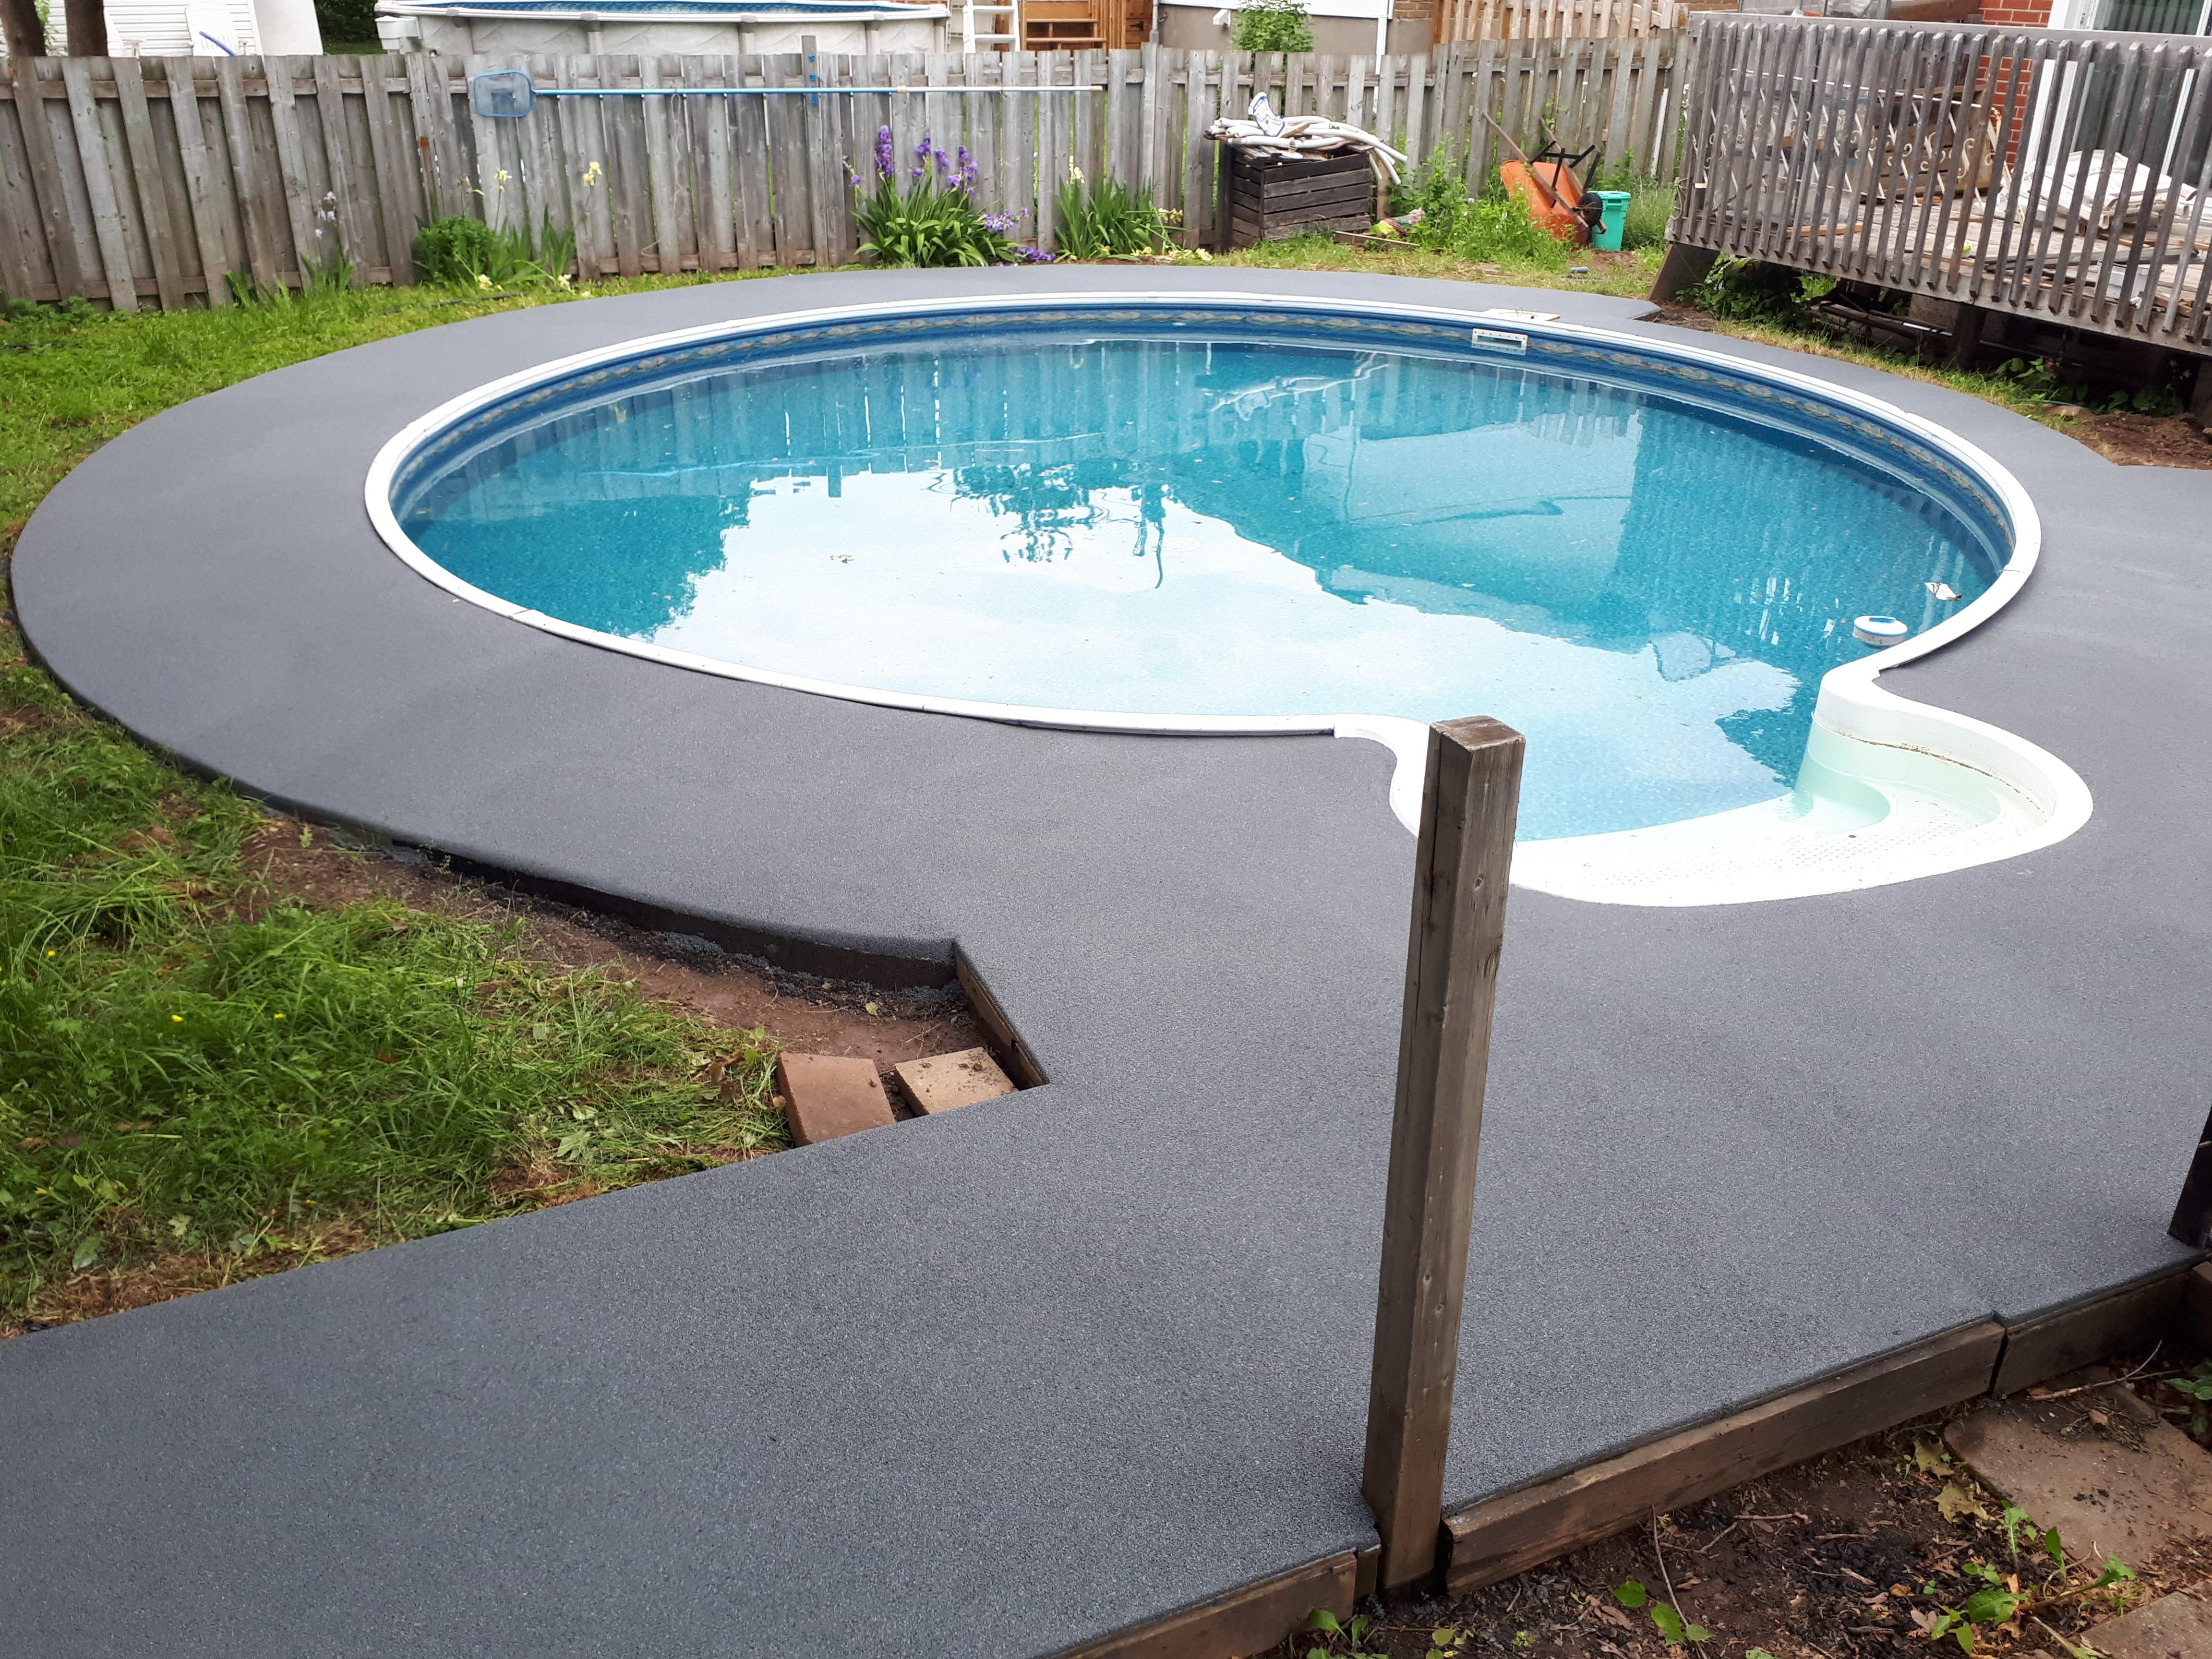 piscine pneu recycl es17 humatraffin. Black Bedroom Furniture Sets. Home Design Ideas